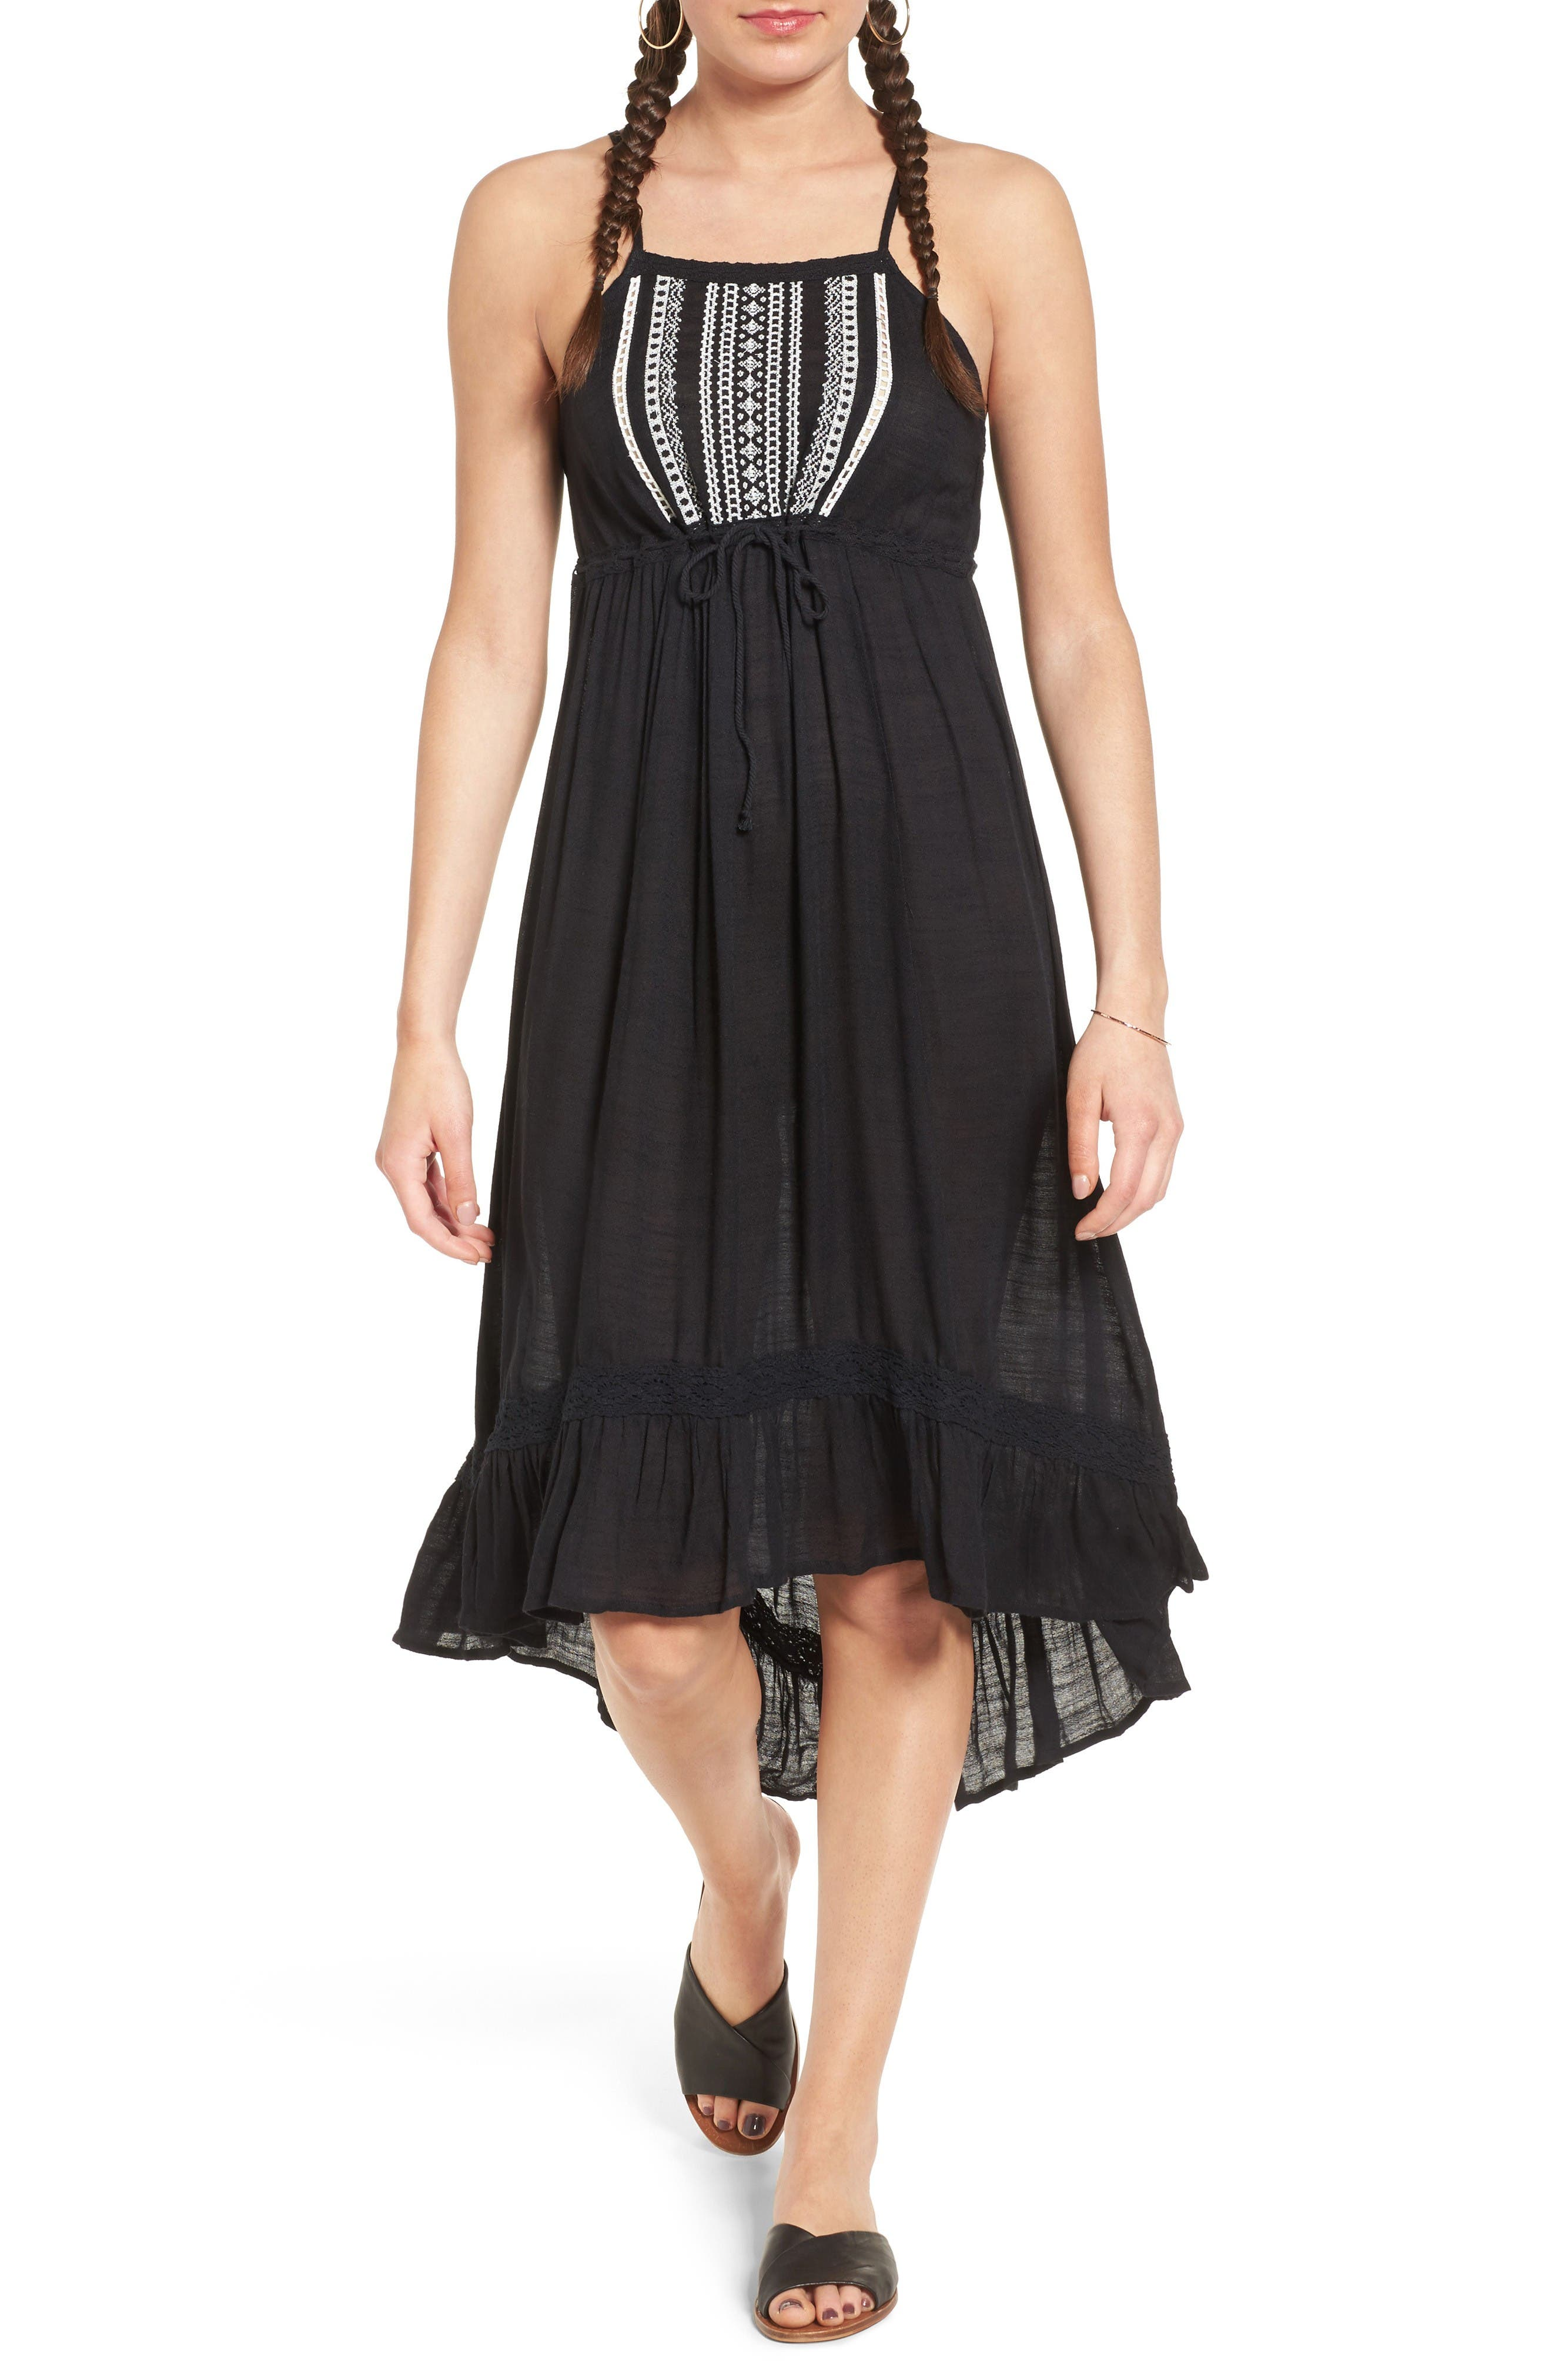 Rip Curl Embroidered Midi Dress